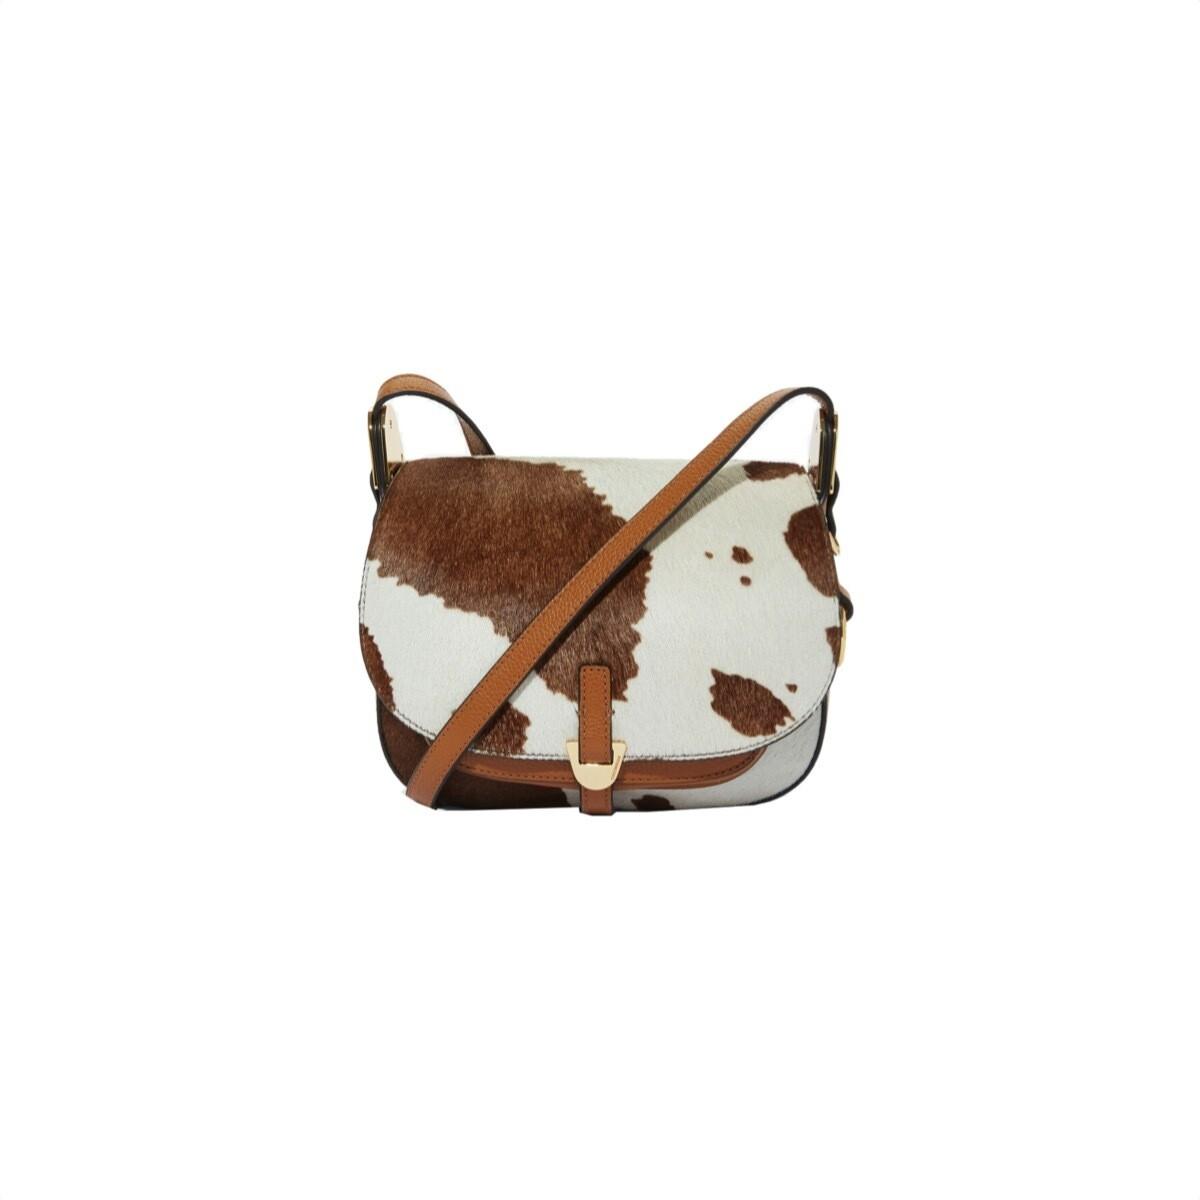 COCCINELLE - Fauve Cow Mini - Multi Moka/Caramel